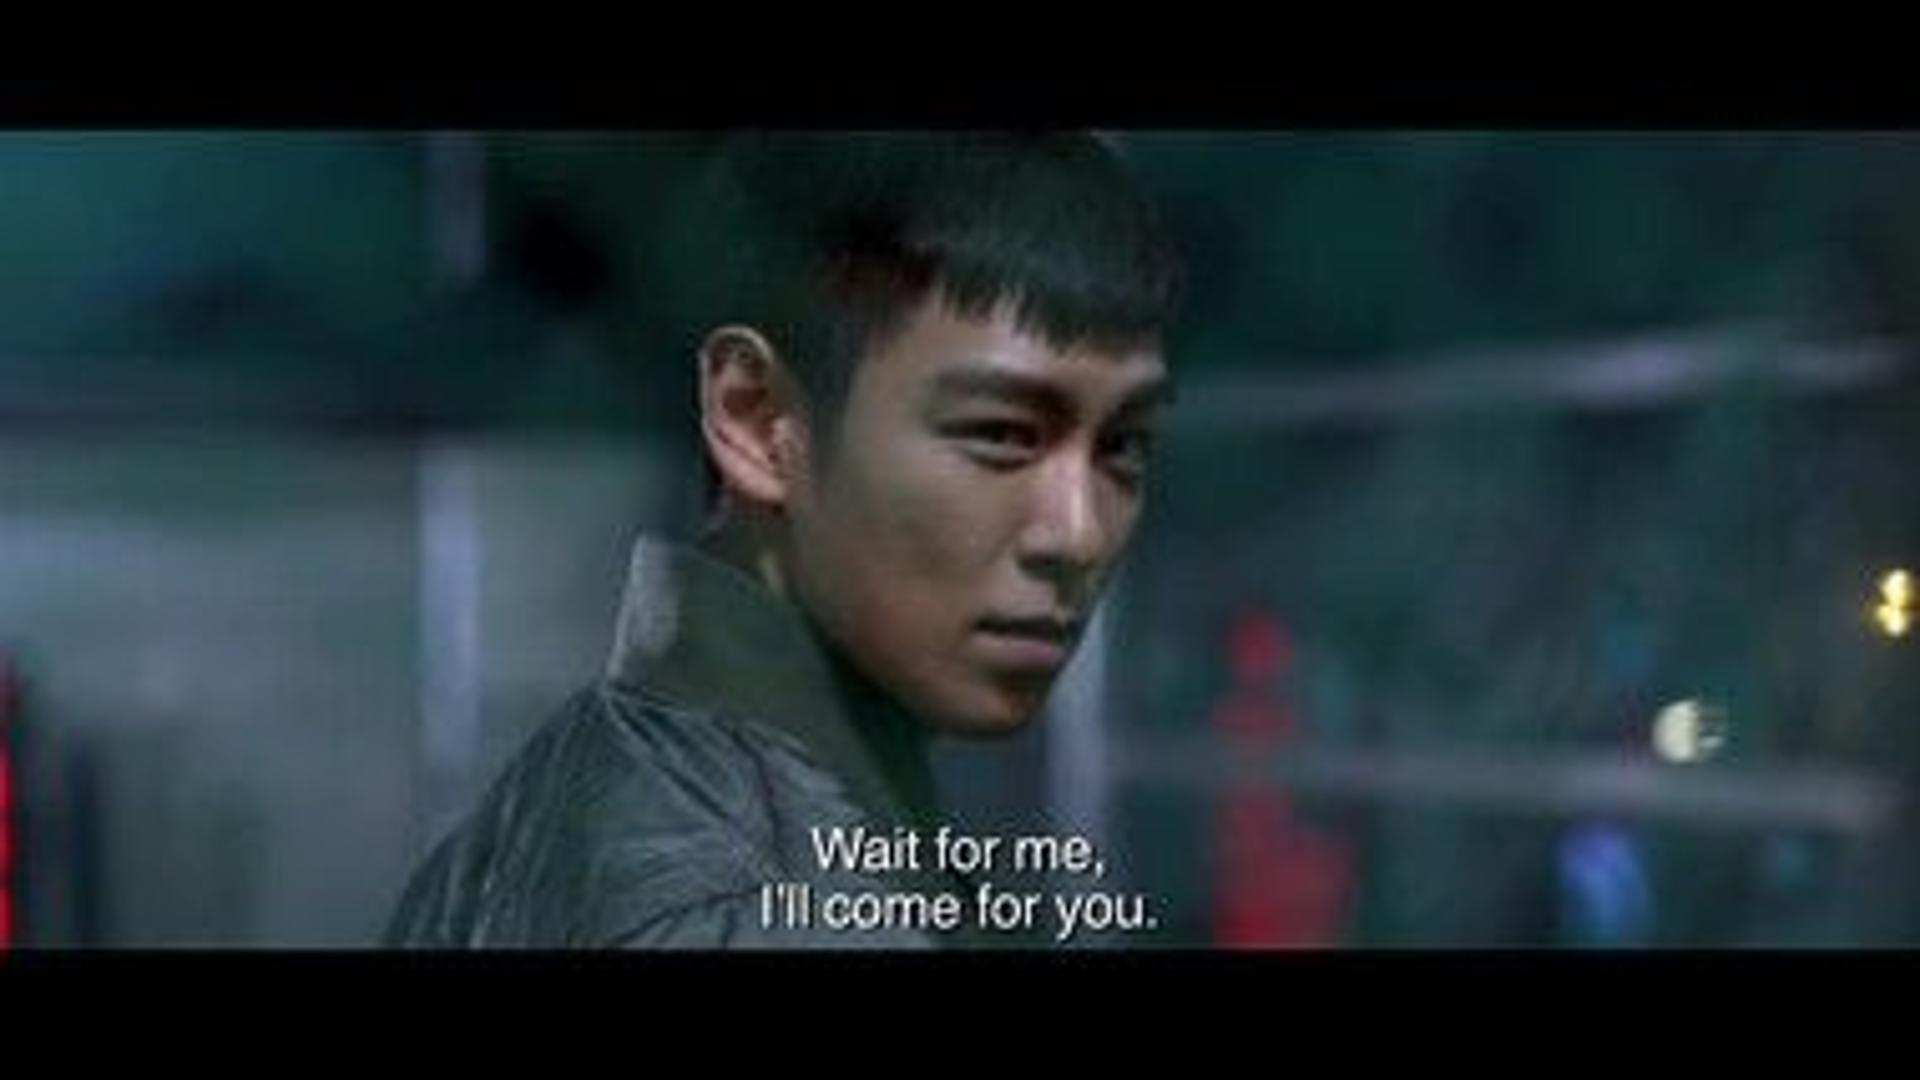 Trailer: Commitment